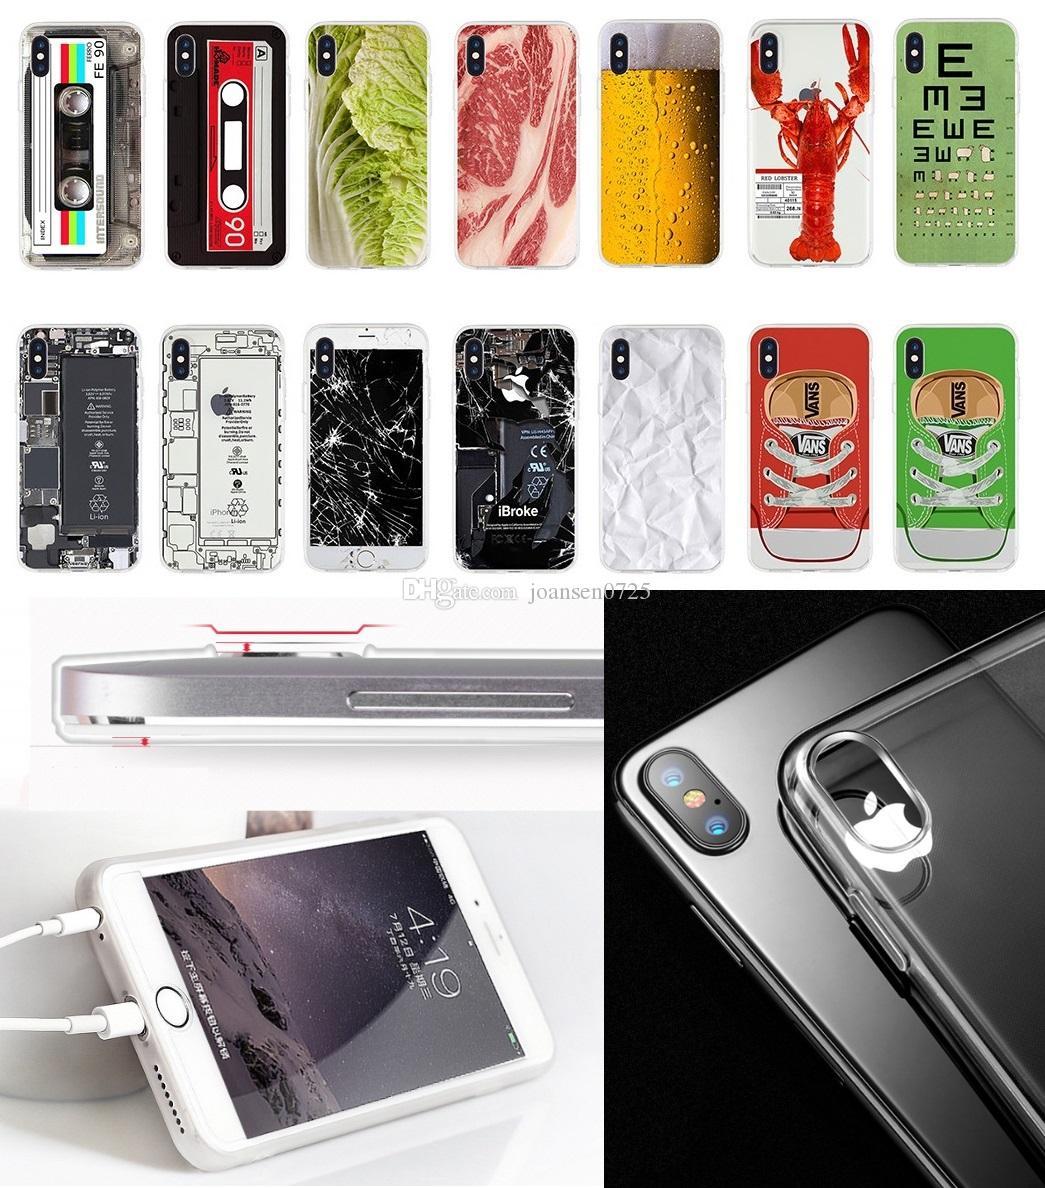 5fb0be4be14 Personalizar Carcasa Para Apple IPhone 6S 8 7 Más X 5S Samsung Galaxy S7  Edge S8 S9 Plus Nota 8 TPU Suave Camuflaje Creativo Pintado De Silicona ...